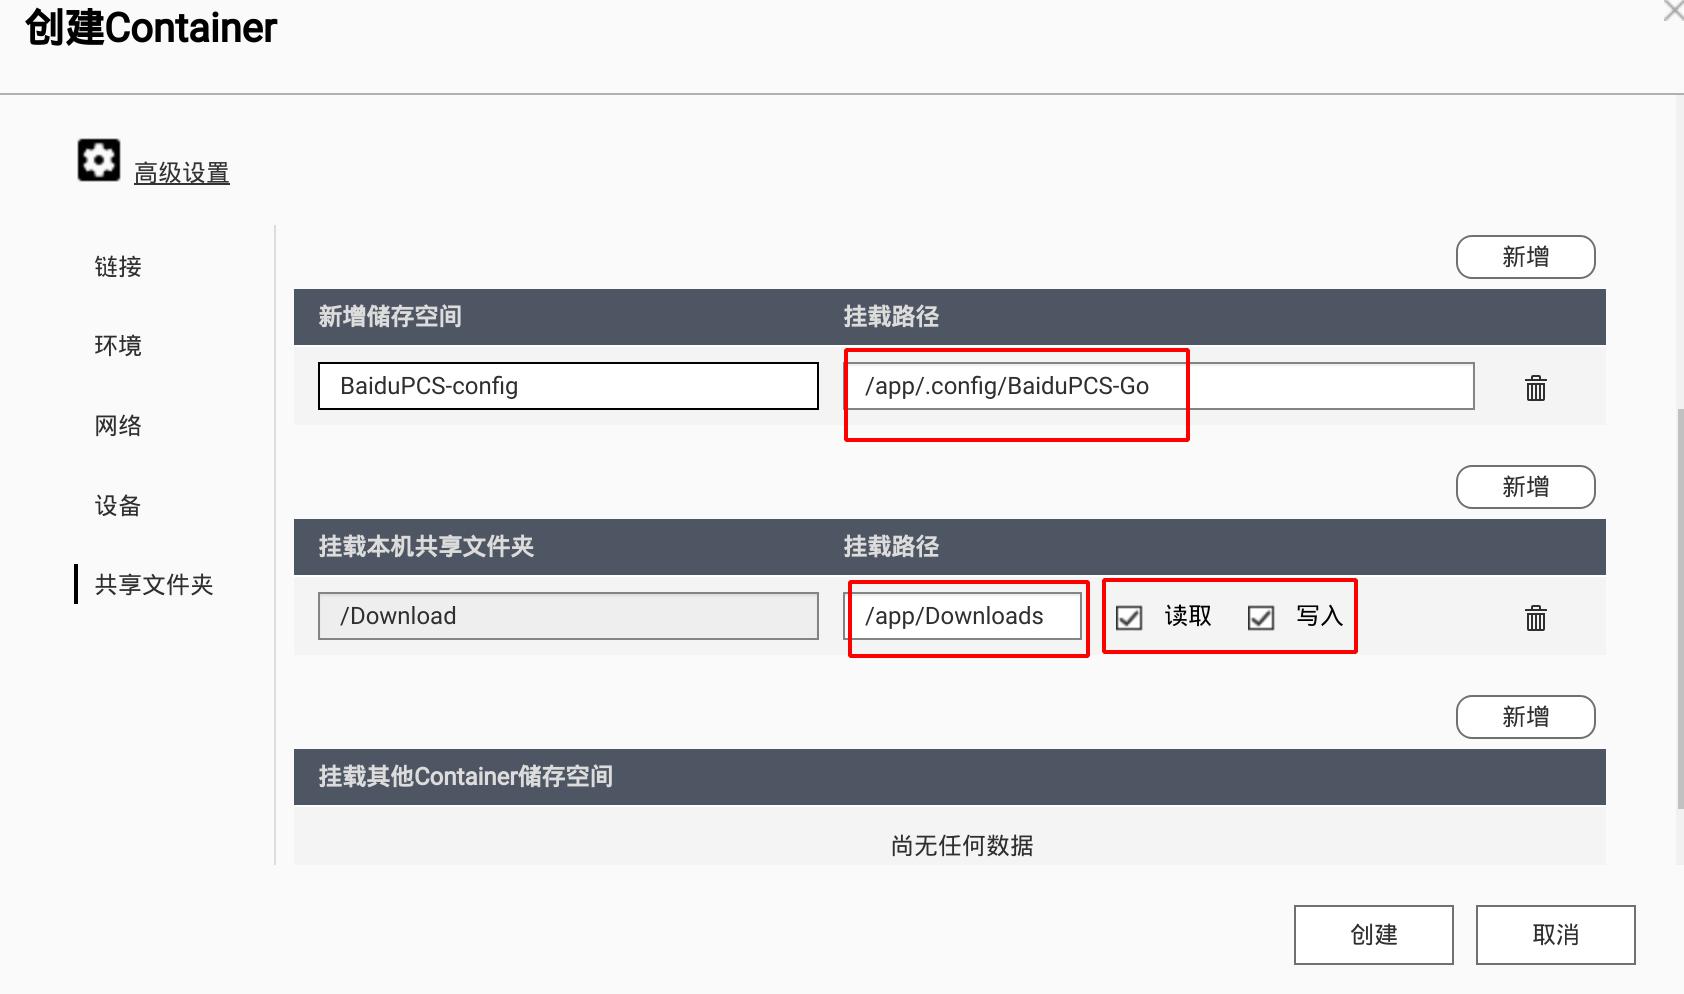 QNAP baidupcs docker step 5